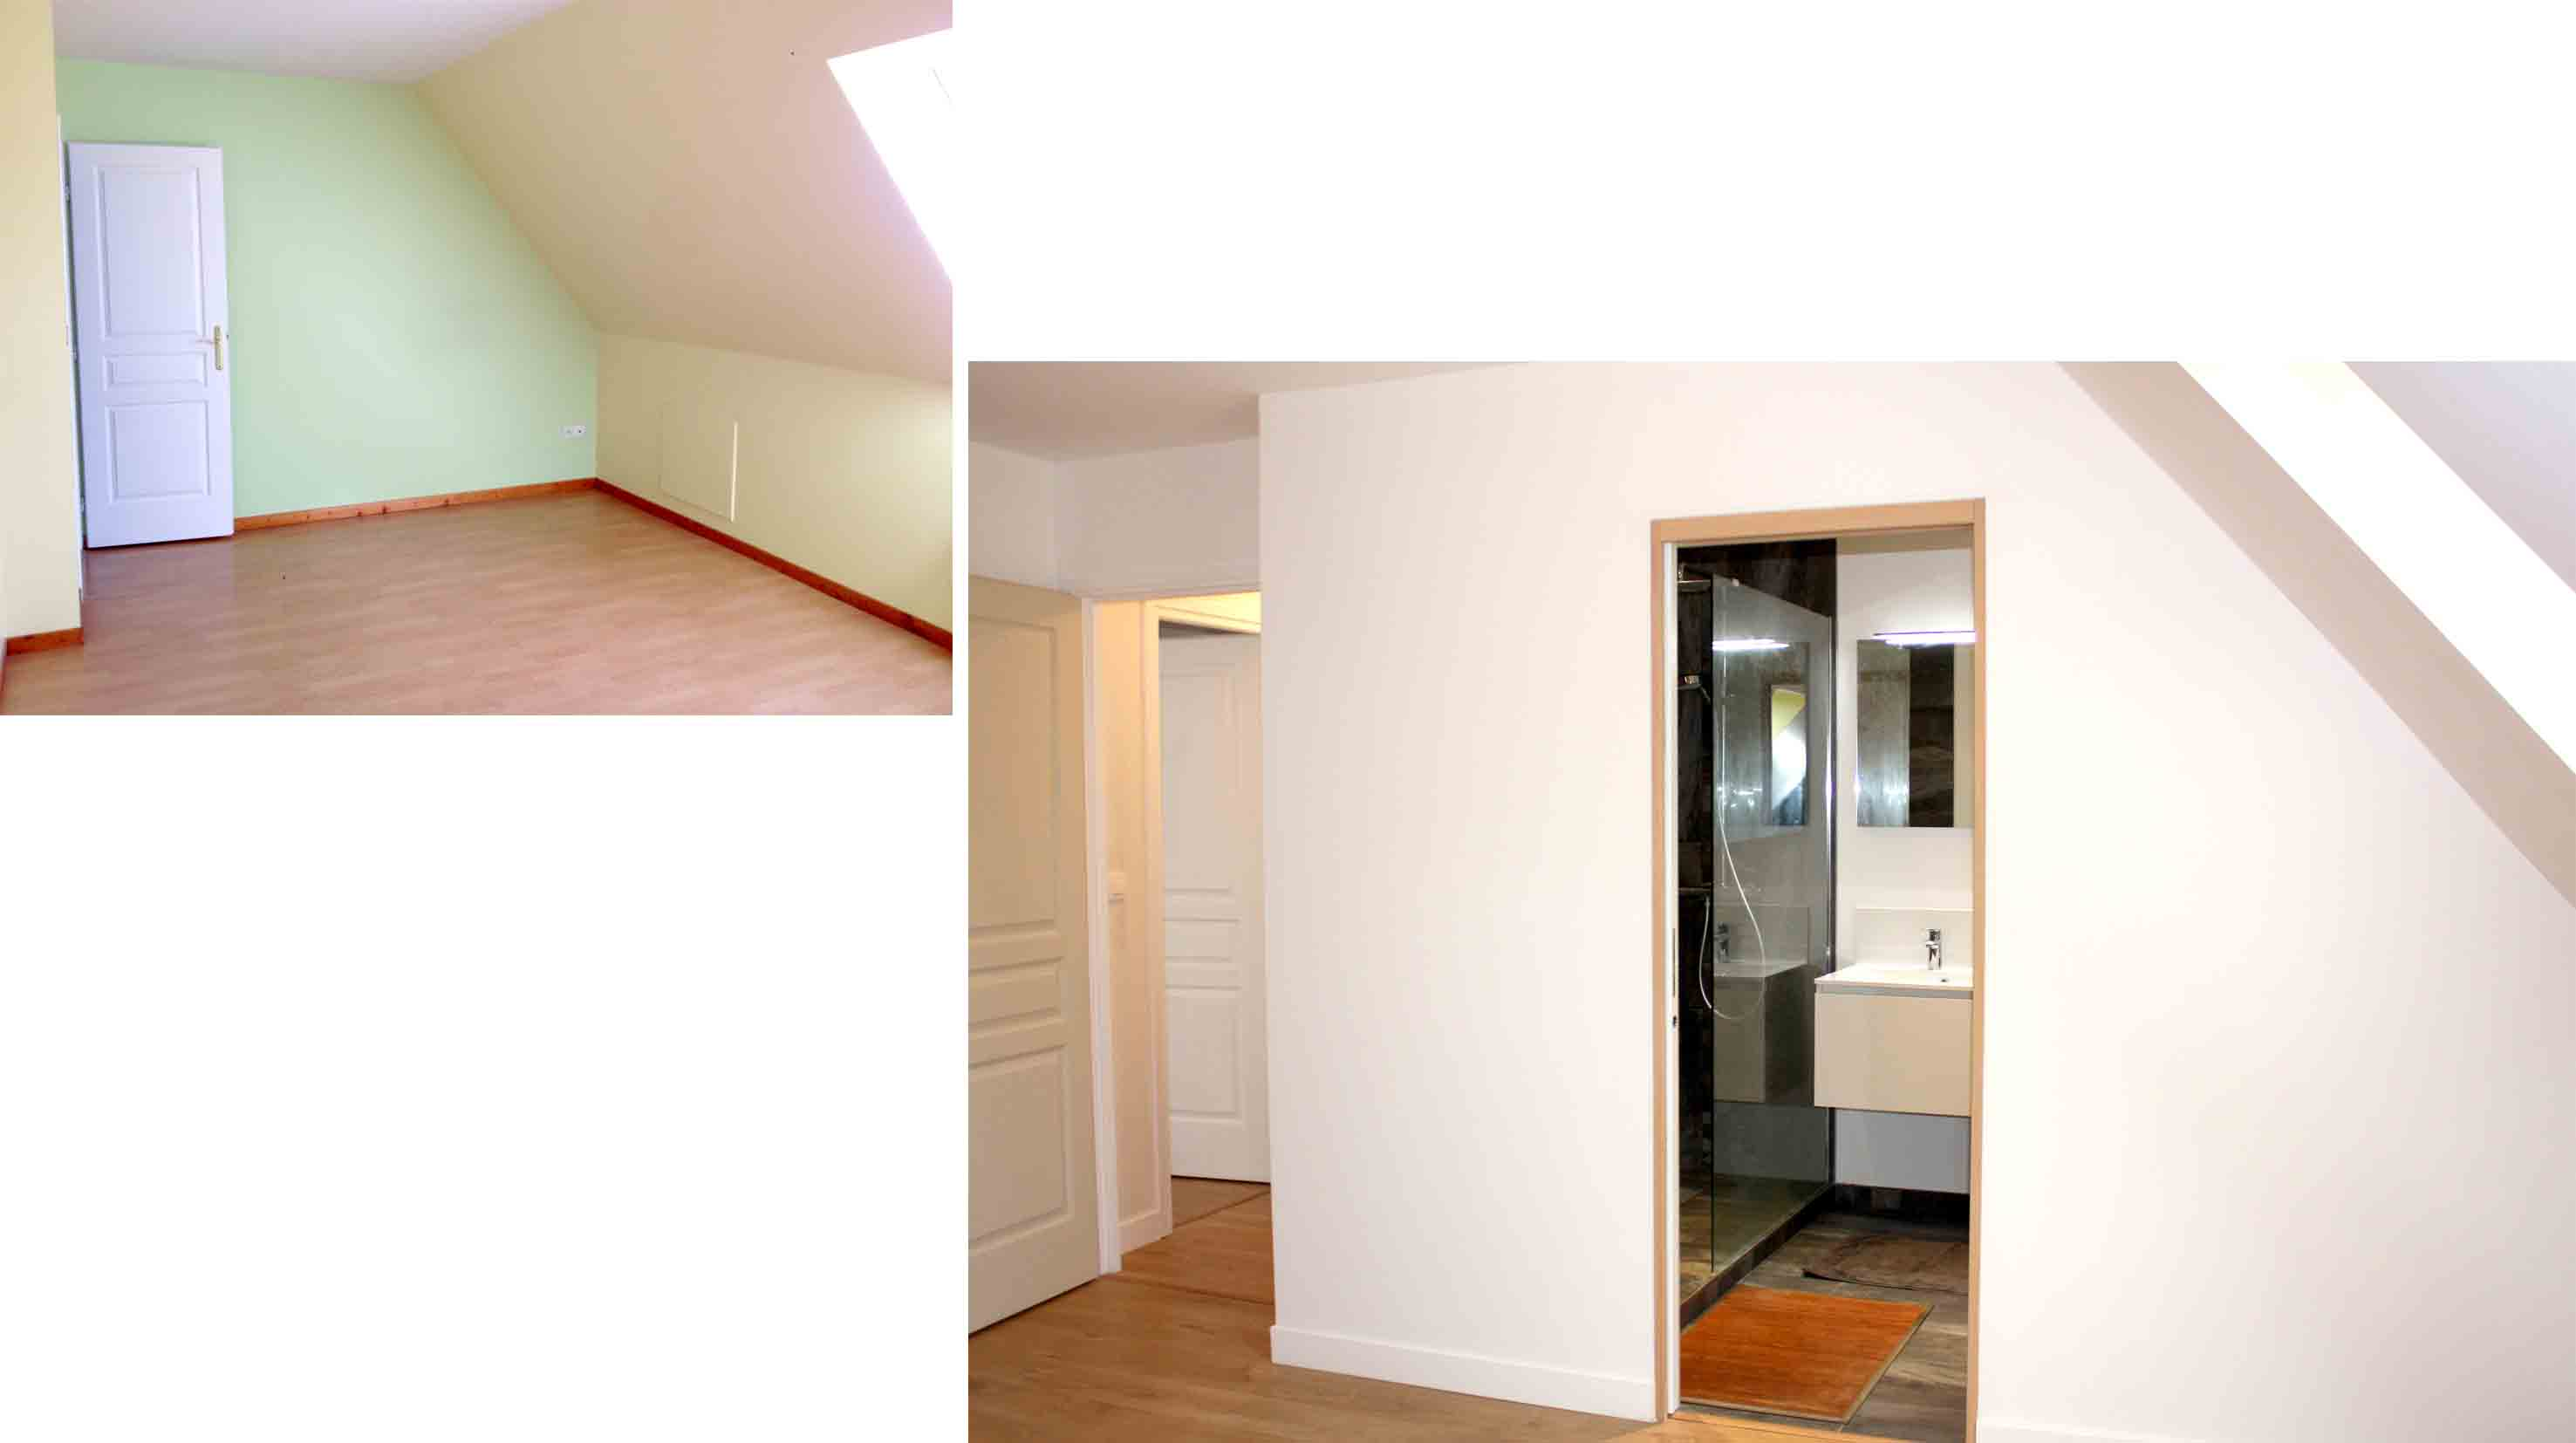 maison familiale lille great location vacances maison ronchin with maison familiale lille. Black Bedroom Furniture Sets. Home Design Ideas